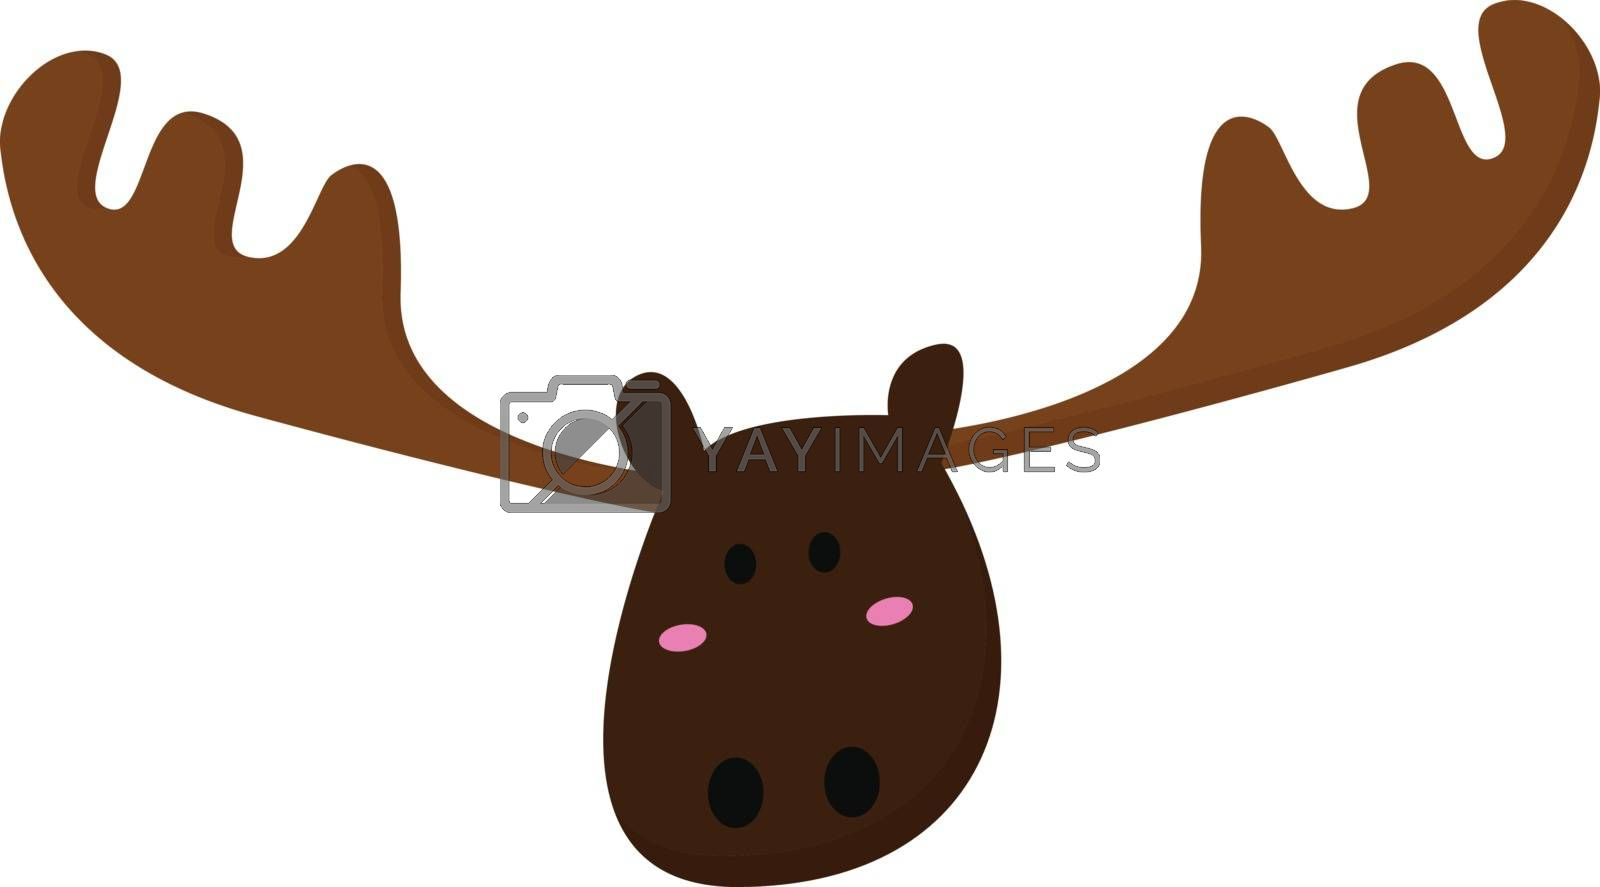 Royalty free image of Emoji of a moose/Cartoon deer vector or color illustration by Morphart